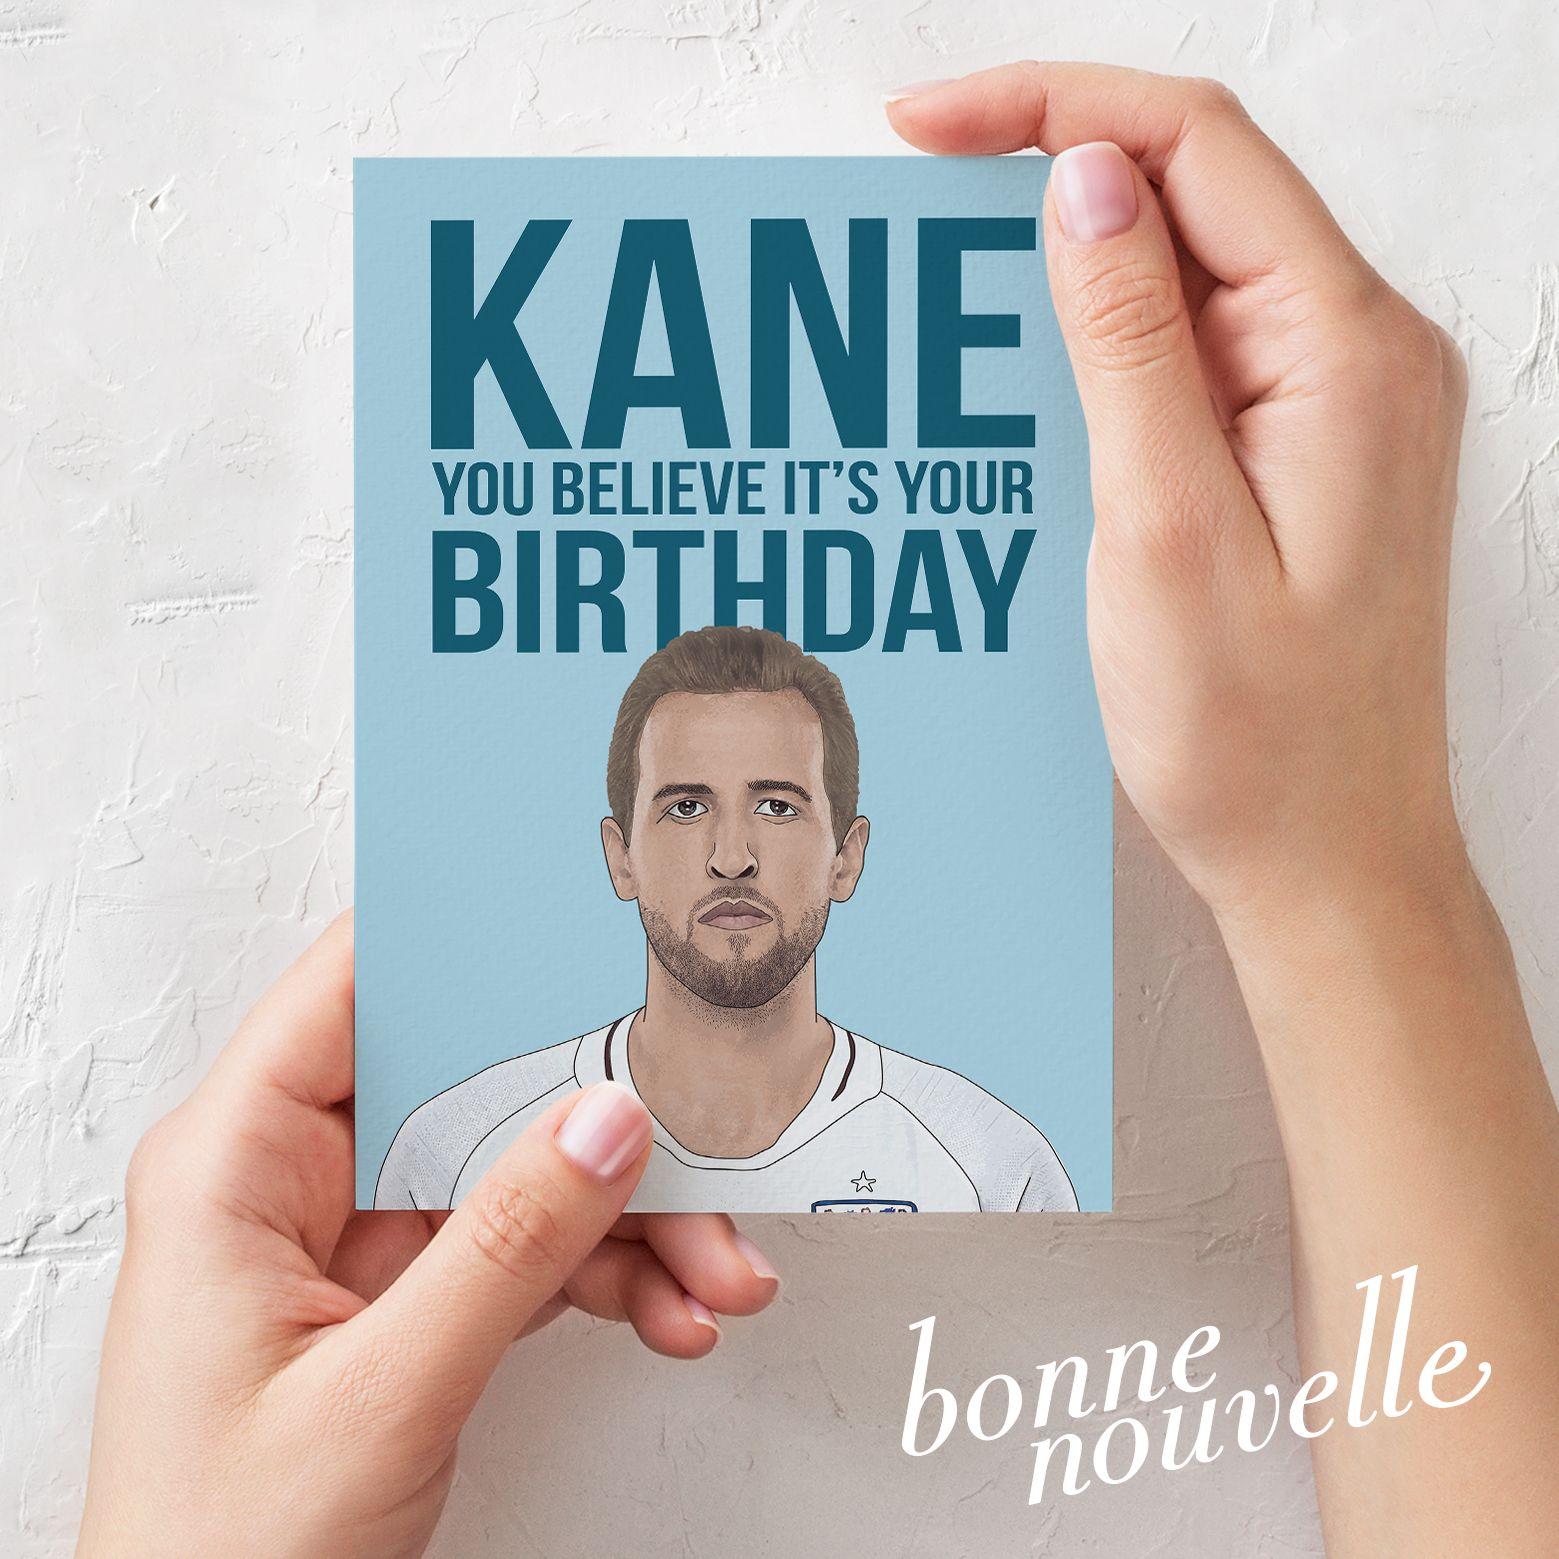 Harry Kane Birthday Card England Football Tottenham Hotspur Fan Harrykane Football Soccer Engl Birthday Cards Birthday Cards For Him Greeting Card Design